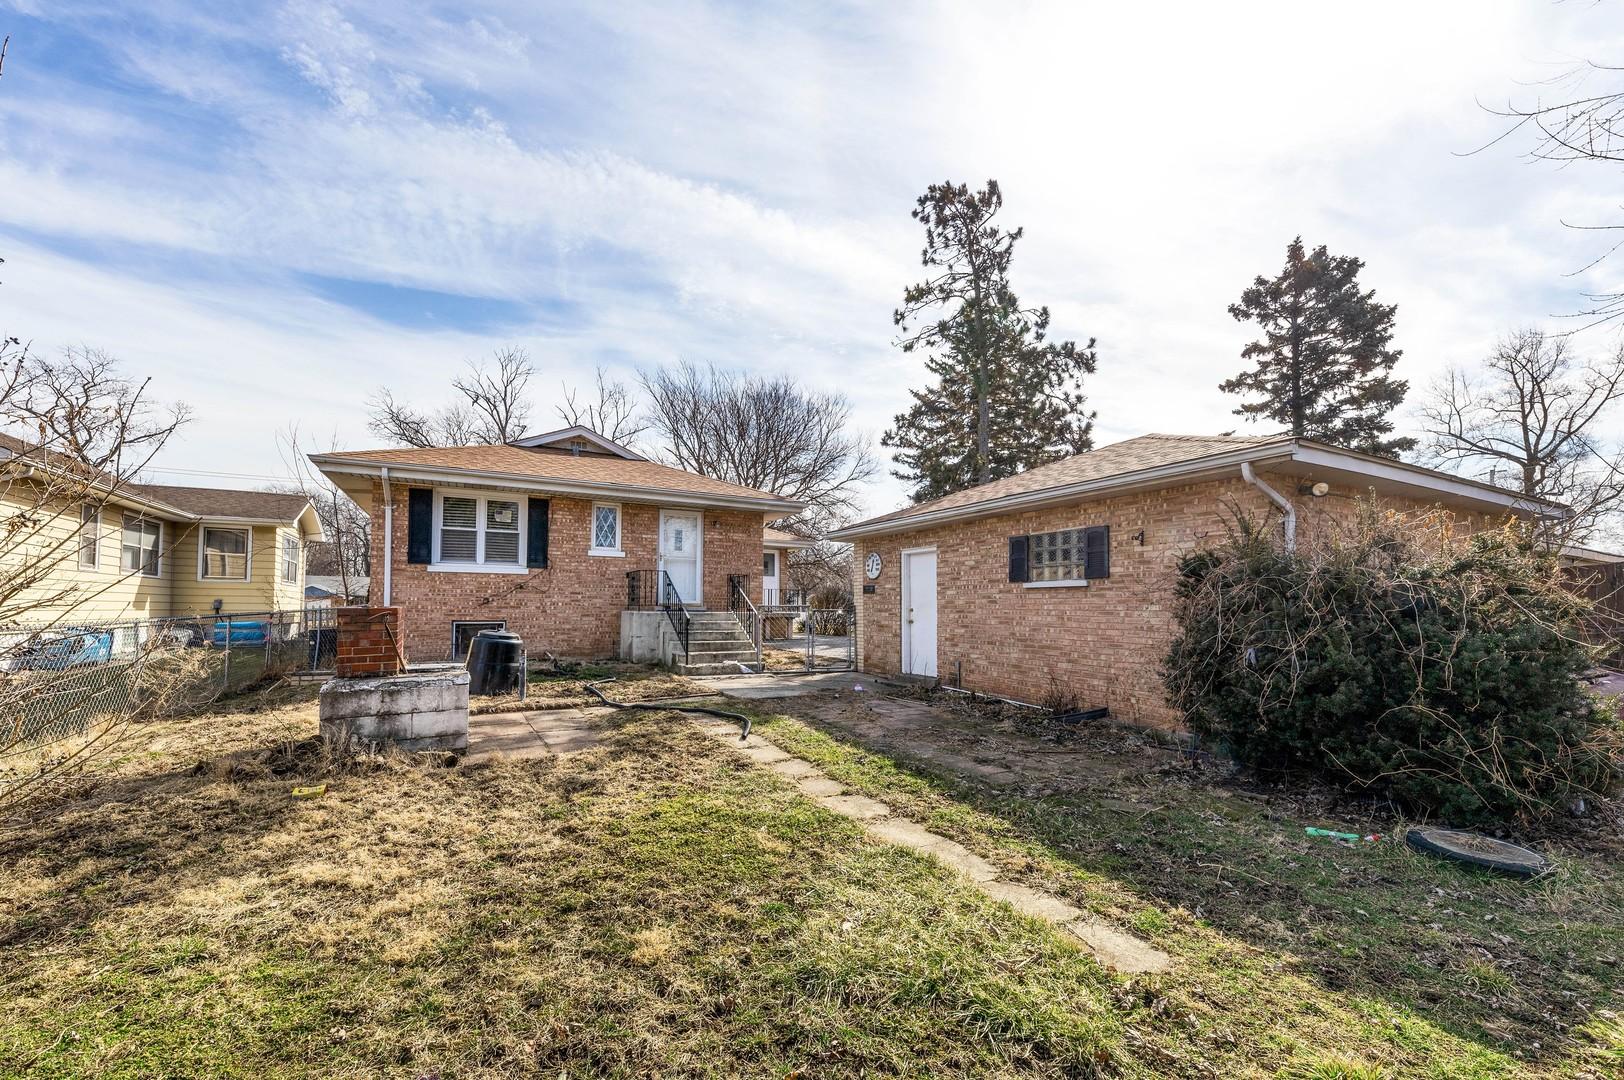 14744 Keeler, Midlothian, Illinois, 60445